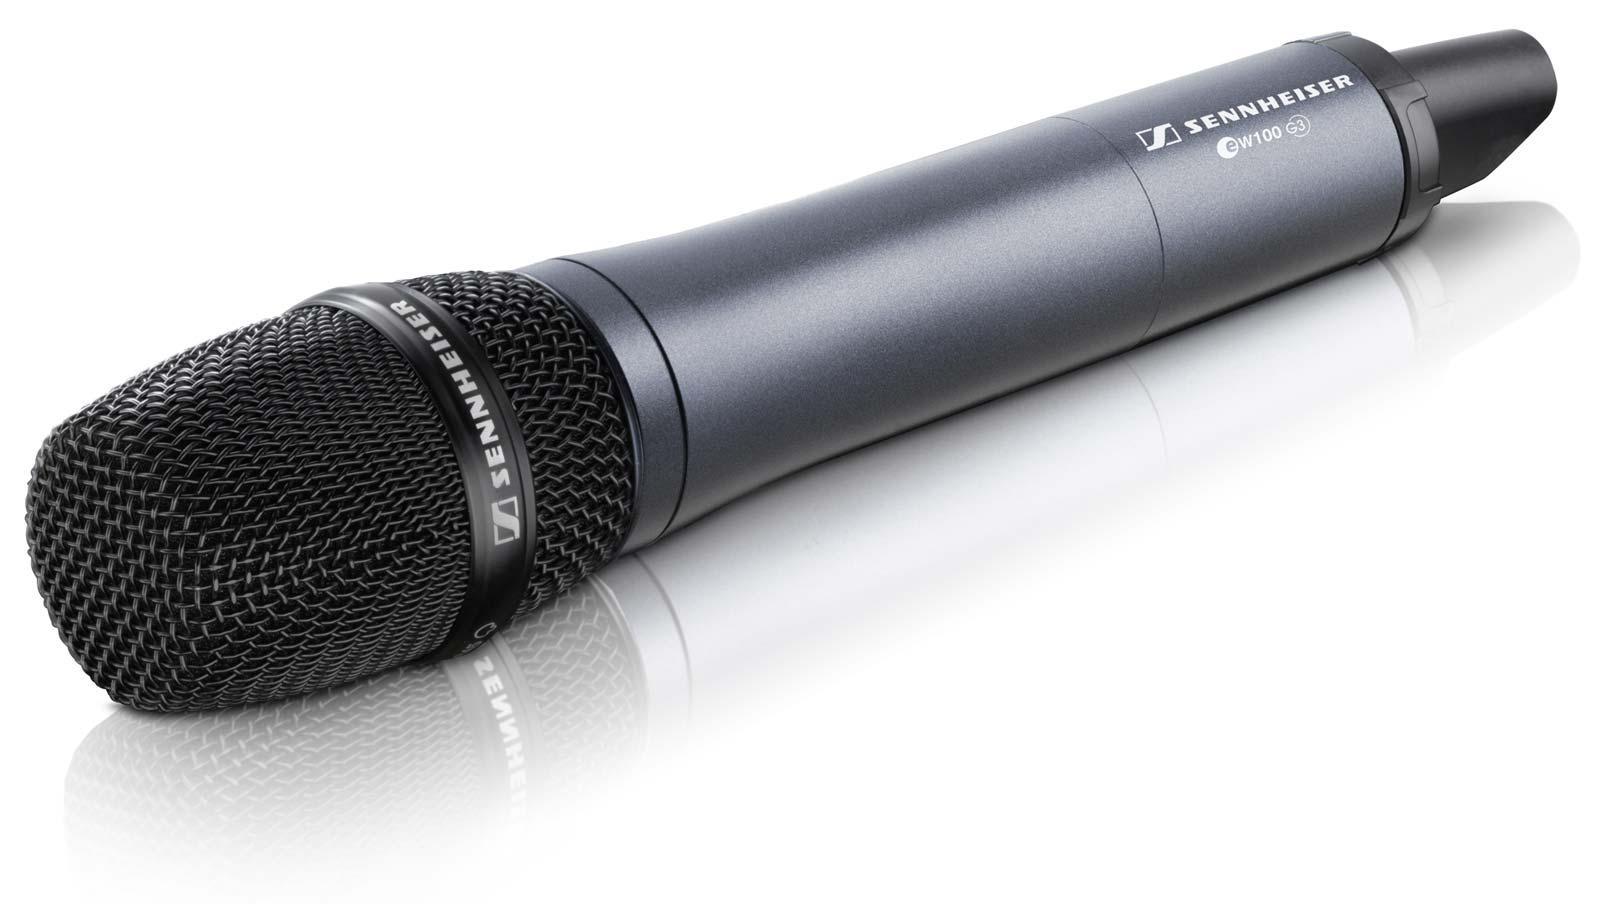 sennheiser ew 145 g3 b handheld wireless microphone system agiprodj. Black Bedroom Furniture Sets. Home Design Ideas